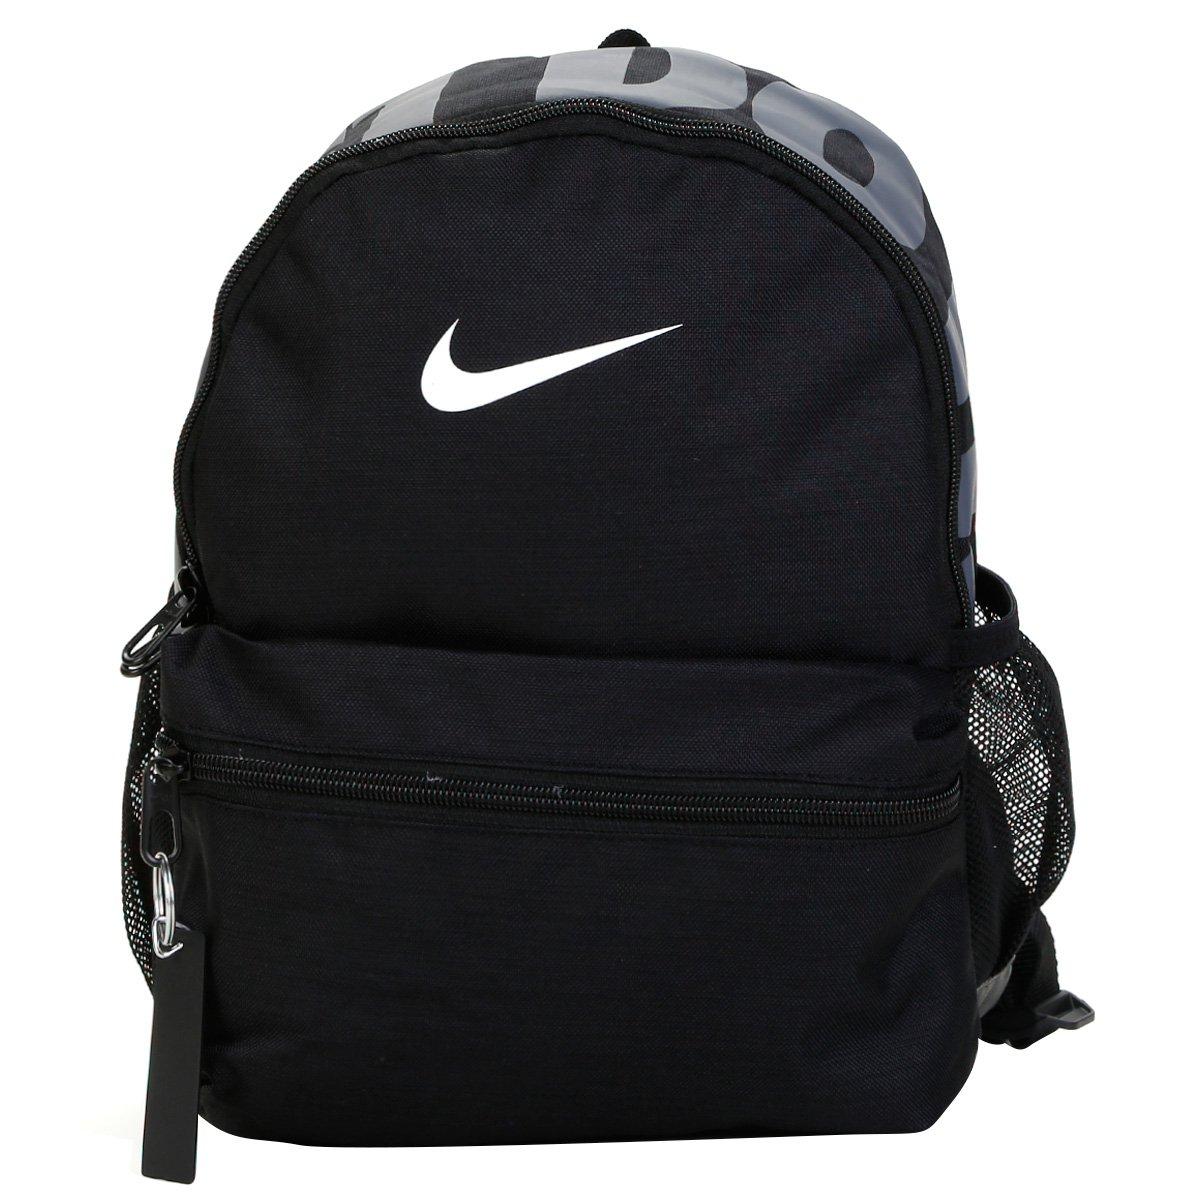 Mochila Nike Brasilia Just Do It Infantil